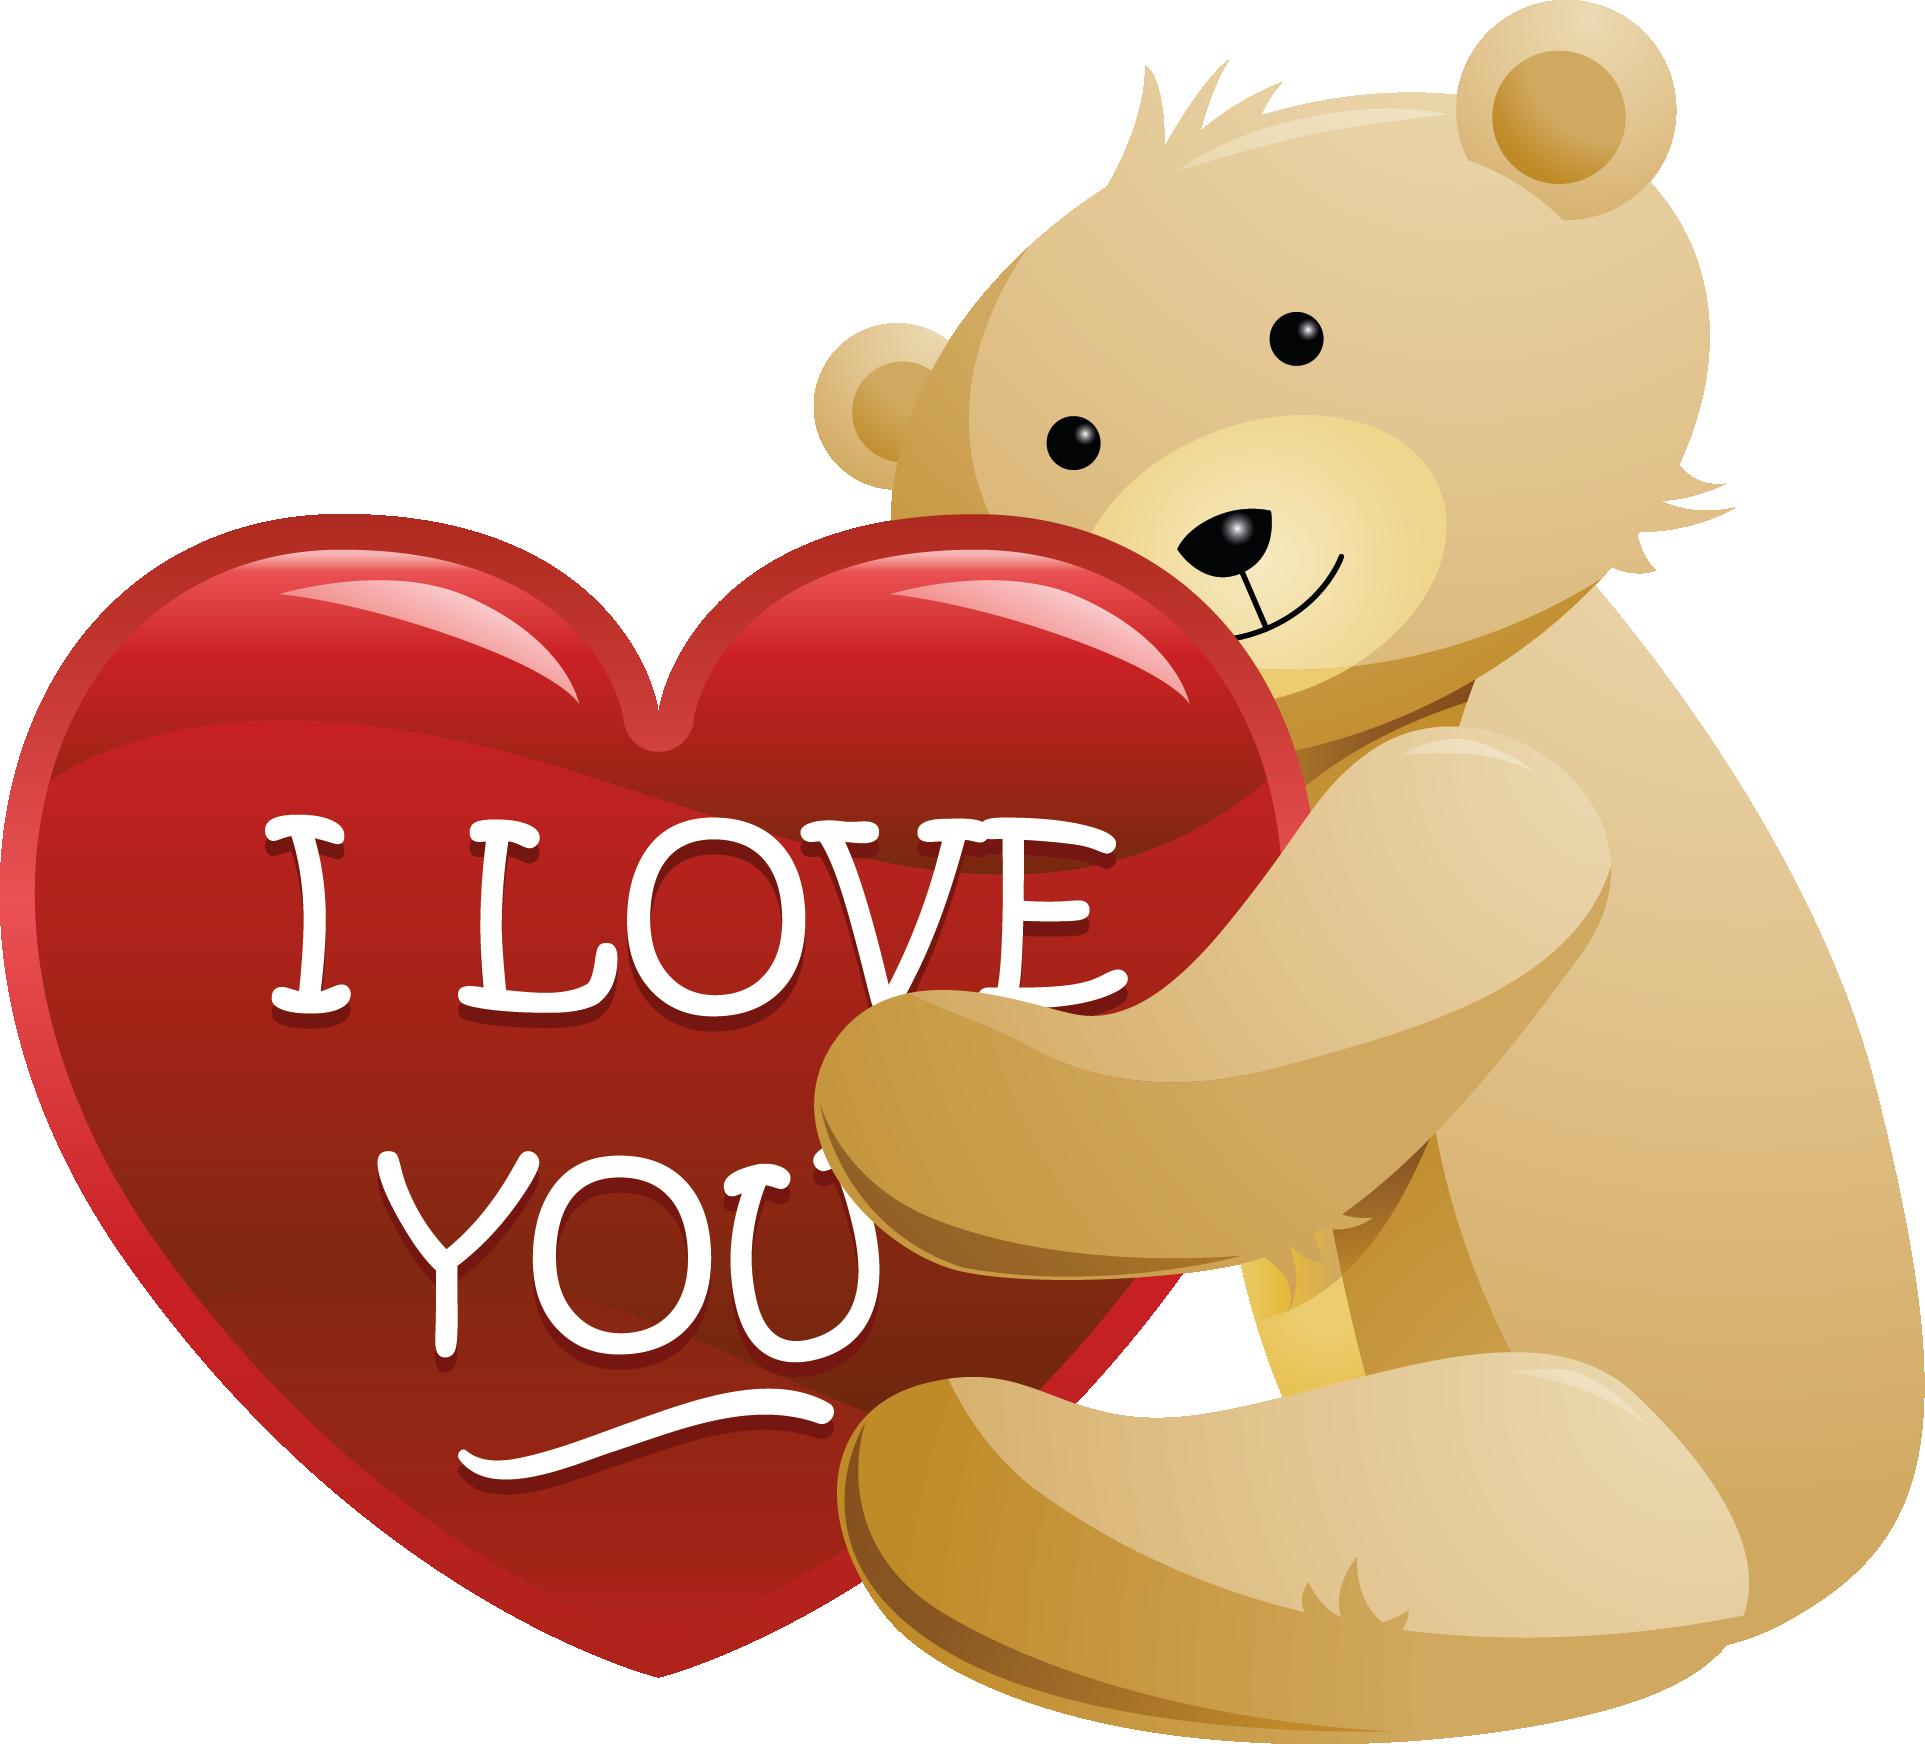 Bear With Love Heart Valentine Red Heart Teddy Bear